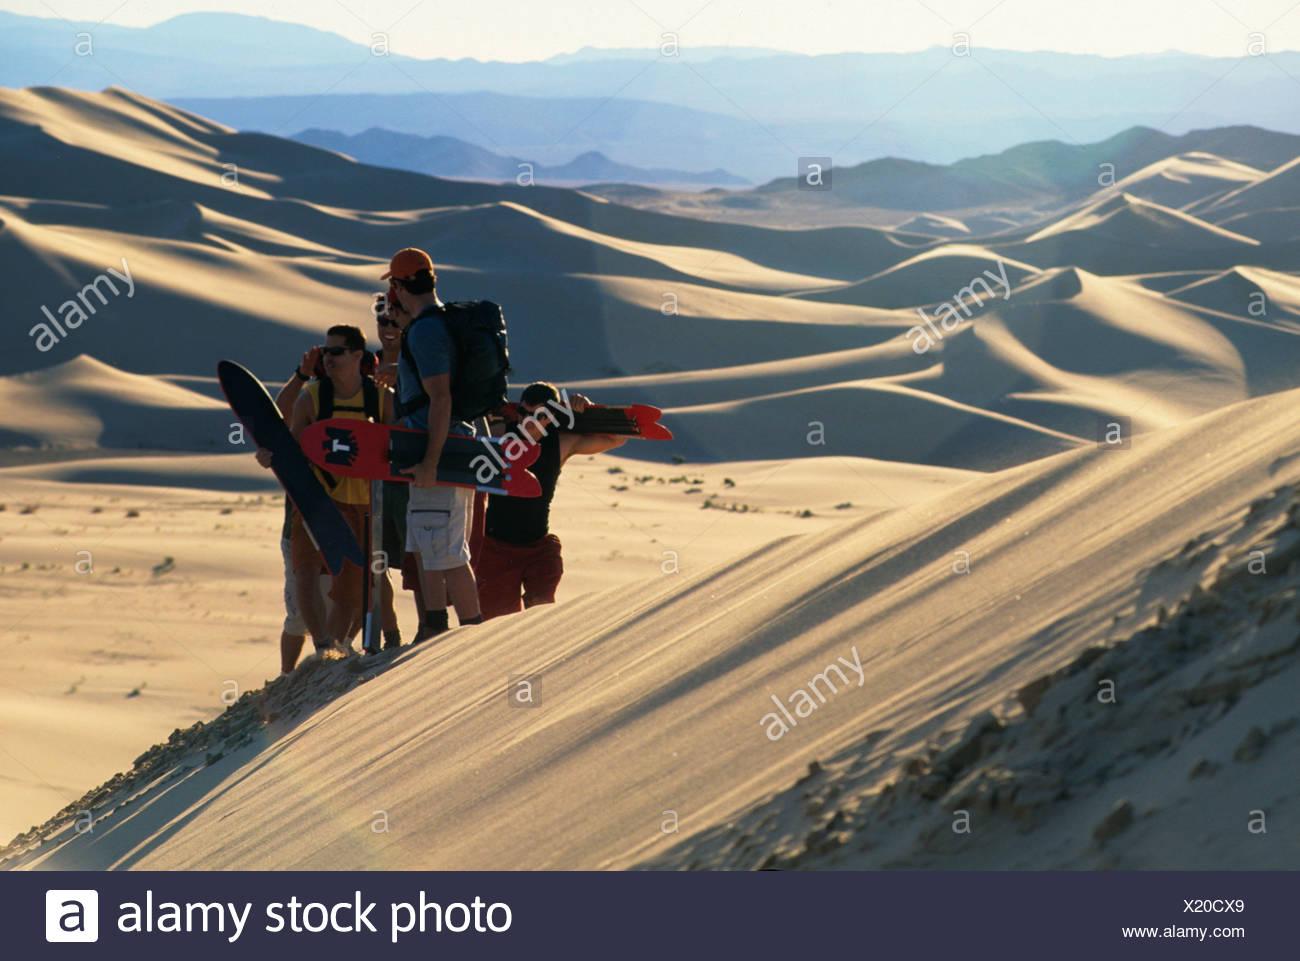 Sandboarding SPORTS - Stock Image